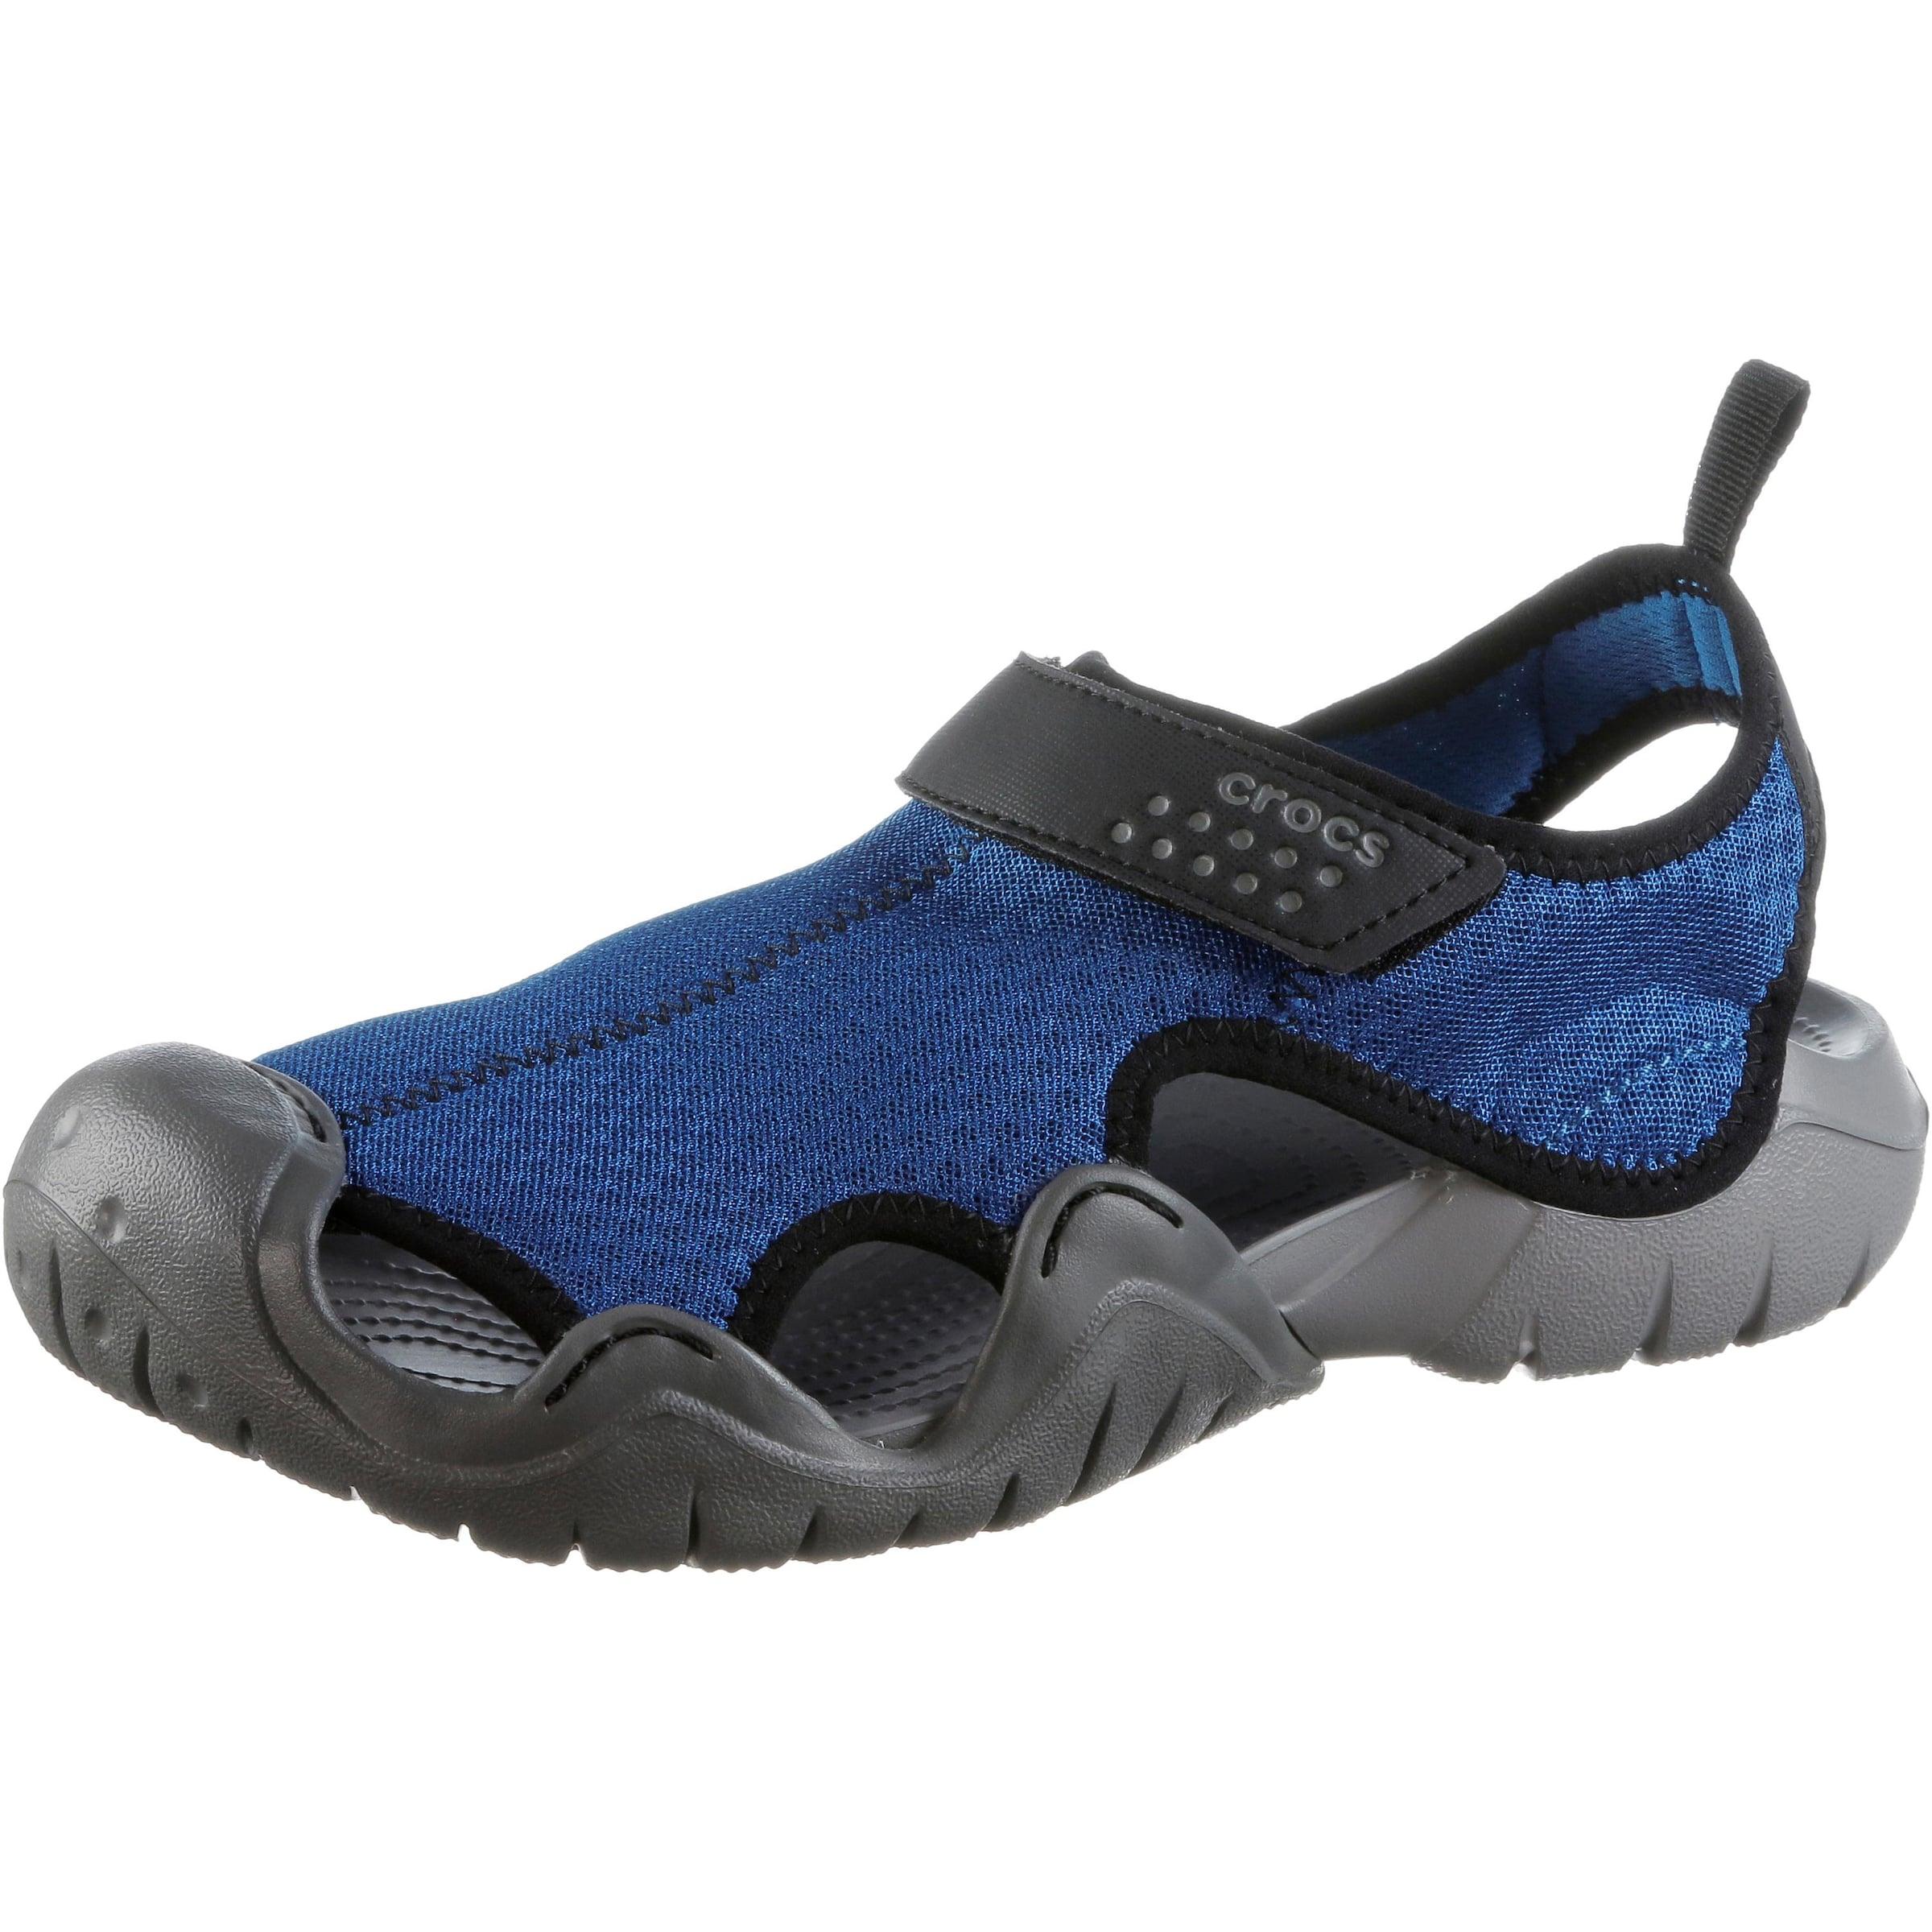 Crocs Sandale Swiftwater Sandal M Hohe Qualität